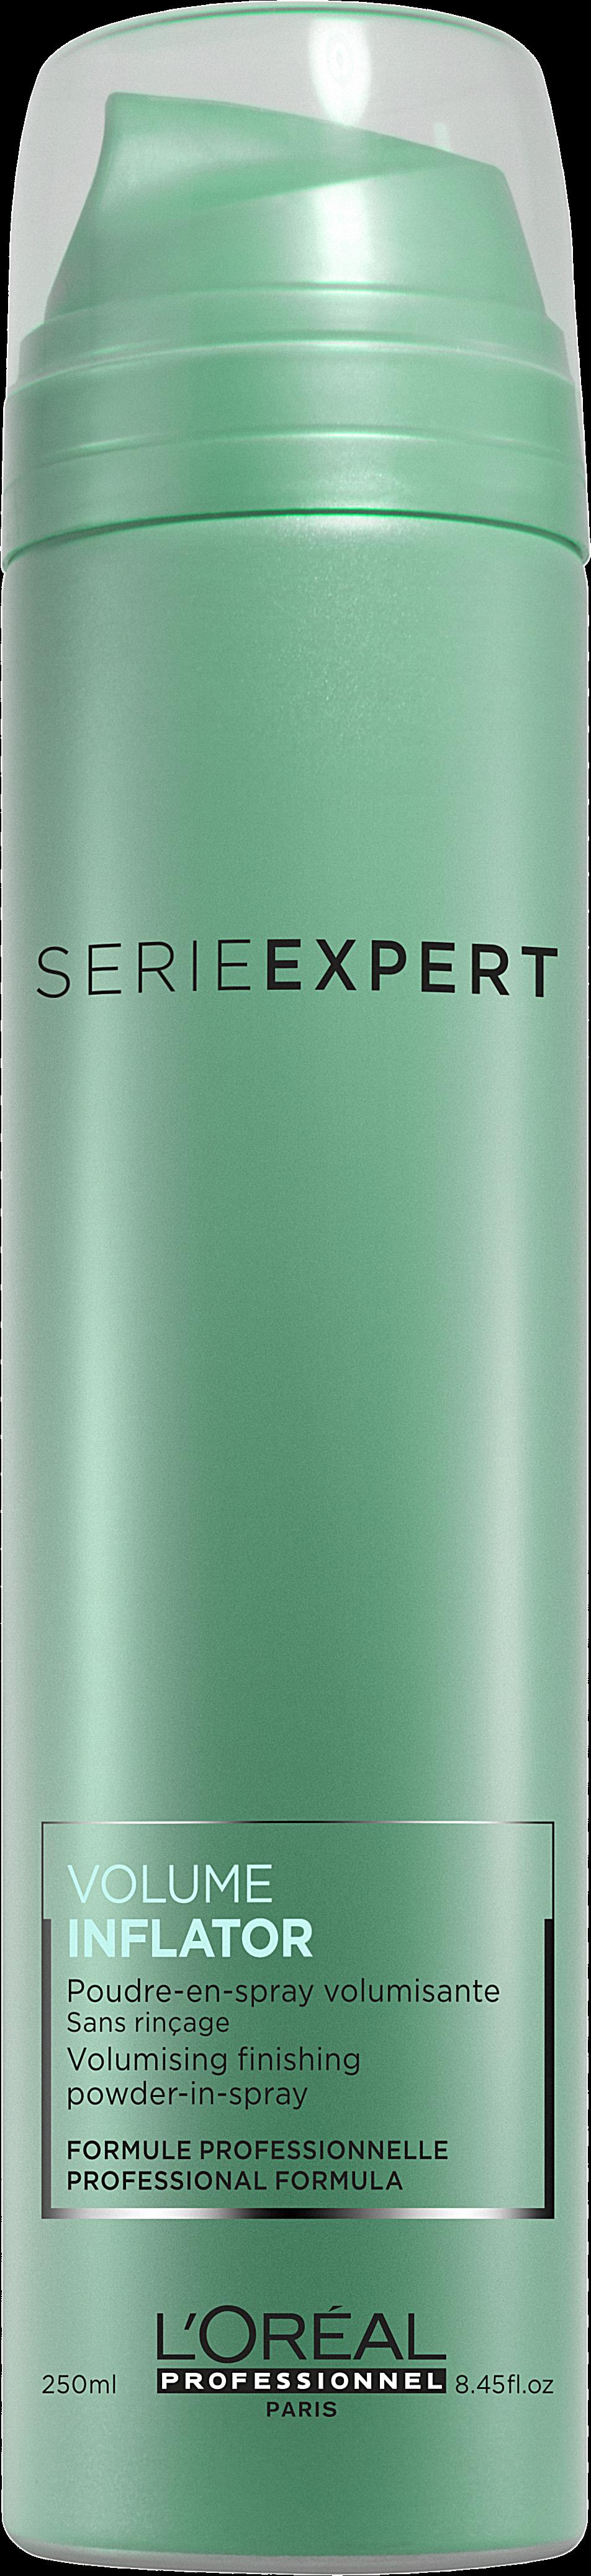 L'Oreal Professionnel Спрей Volumetry Волюмастер, 250 мл loreal professional volumetry спрей